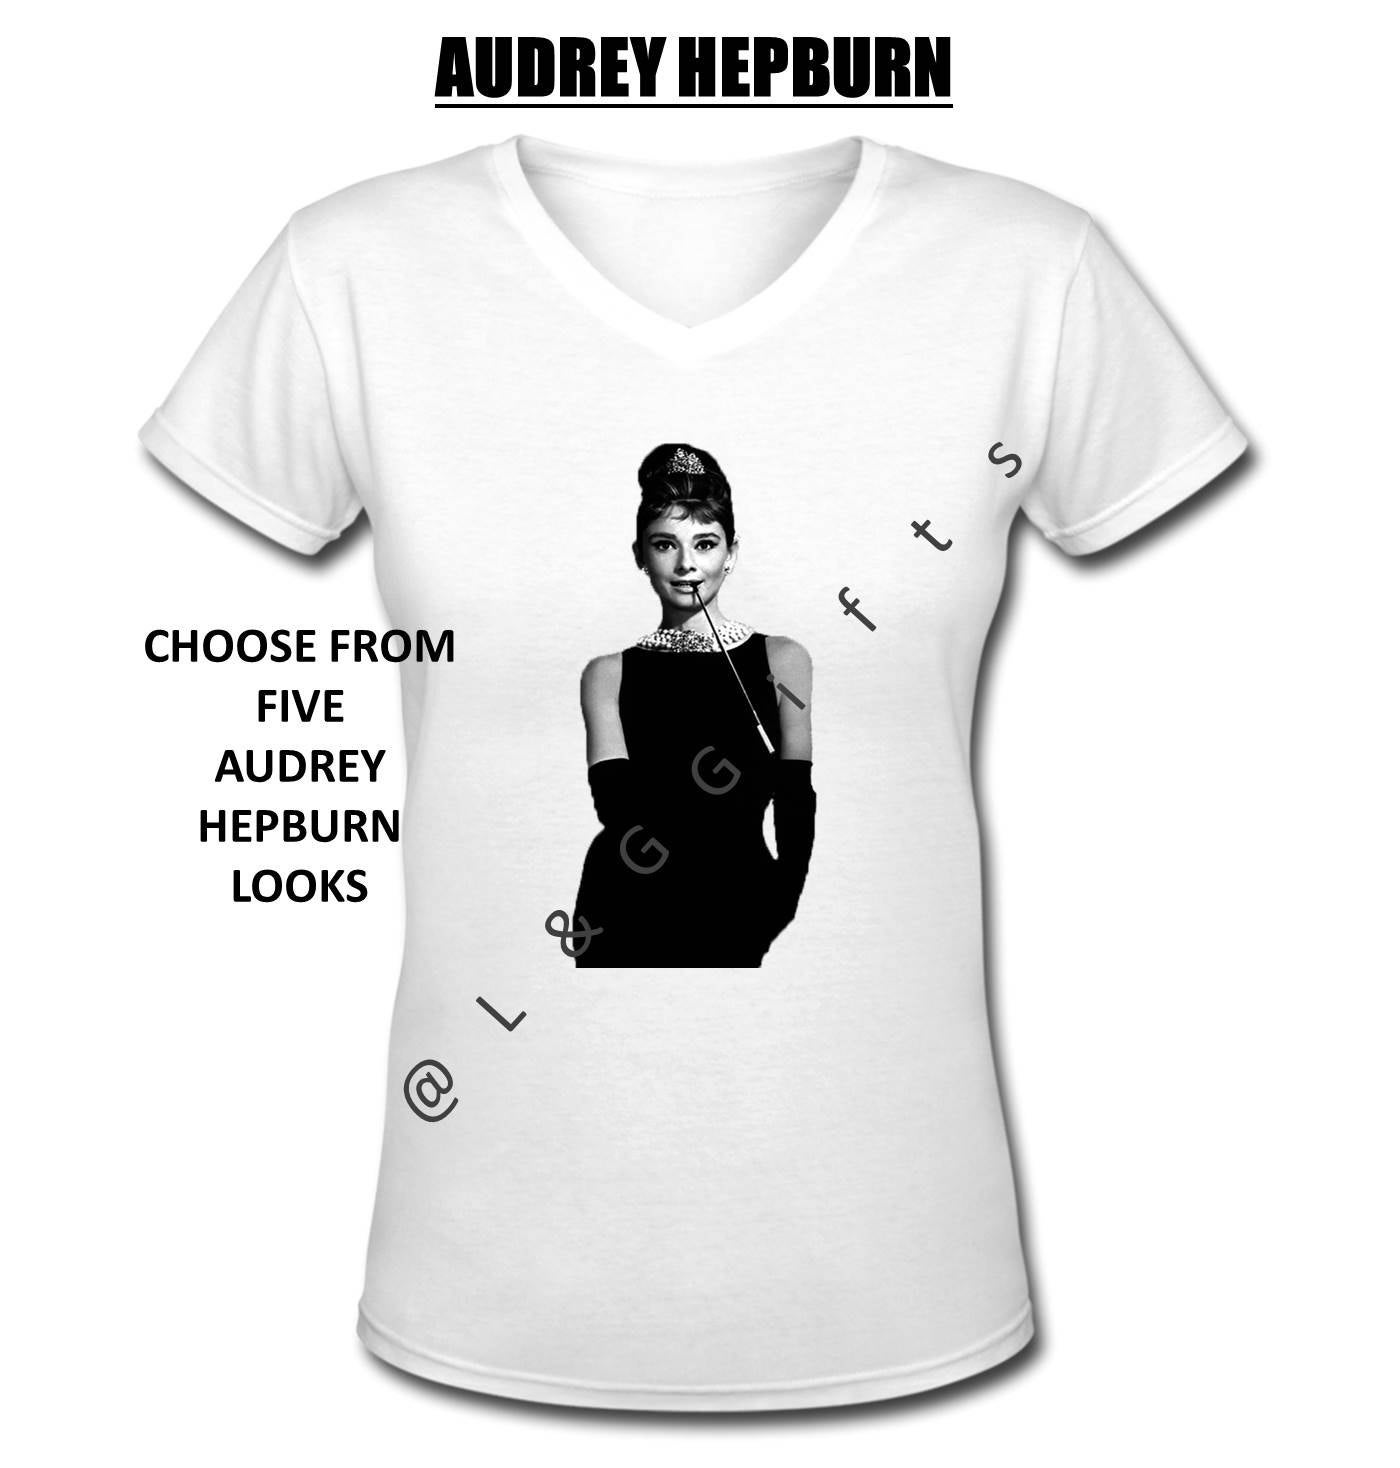 4719ff41 Audrey Hepburn T shirt Audrey Hepburn Pictures Old Hollywood | Etsy